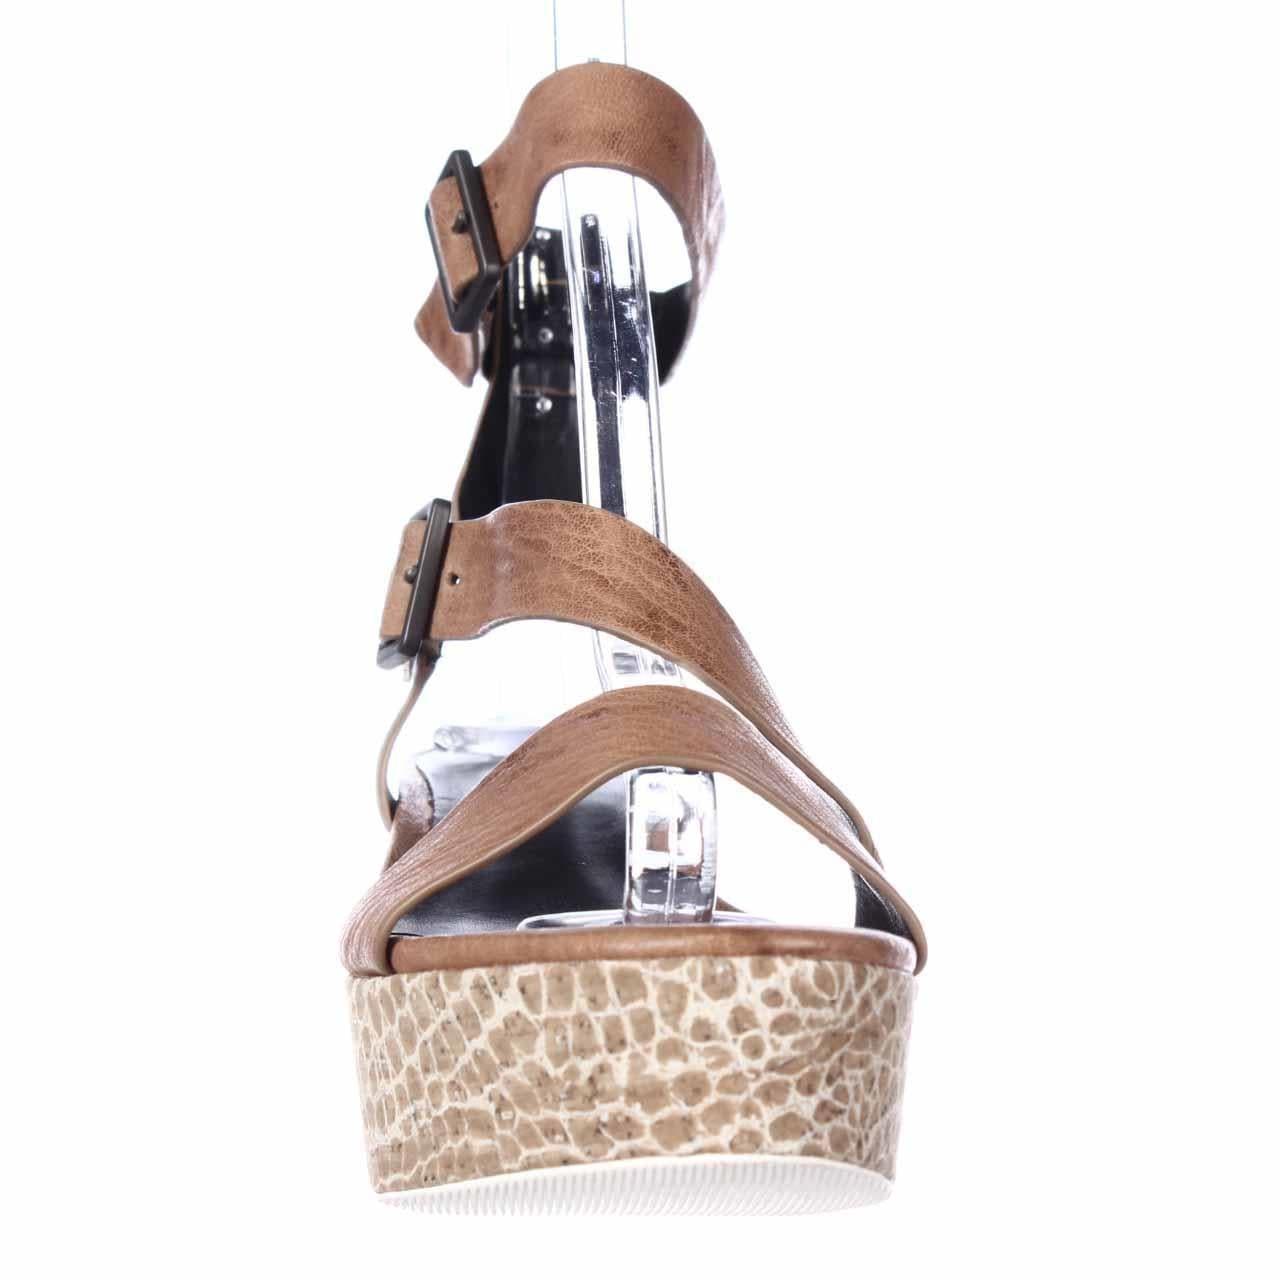 70bdb70e9c7 Shop Elie Tahari Mustique Strappy Platform Sandals